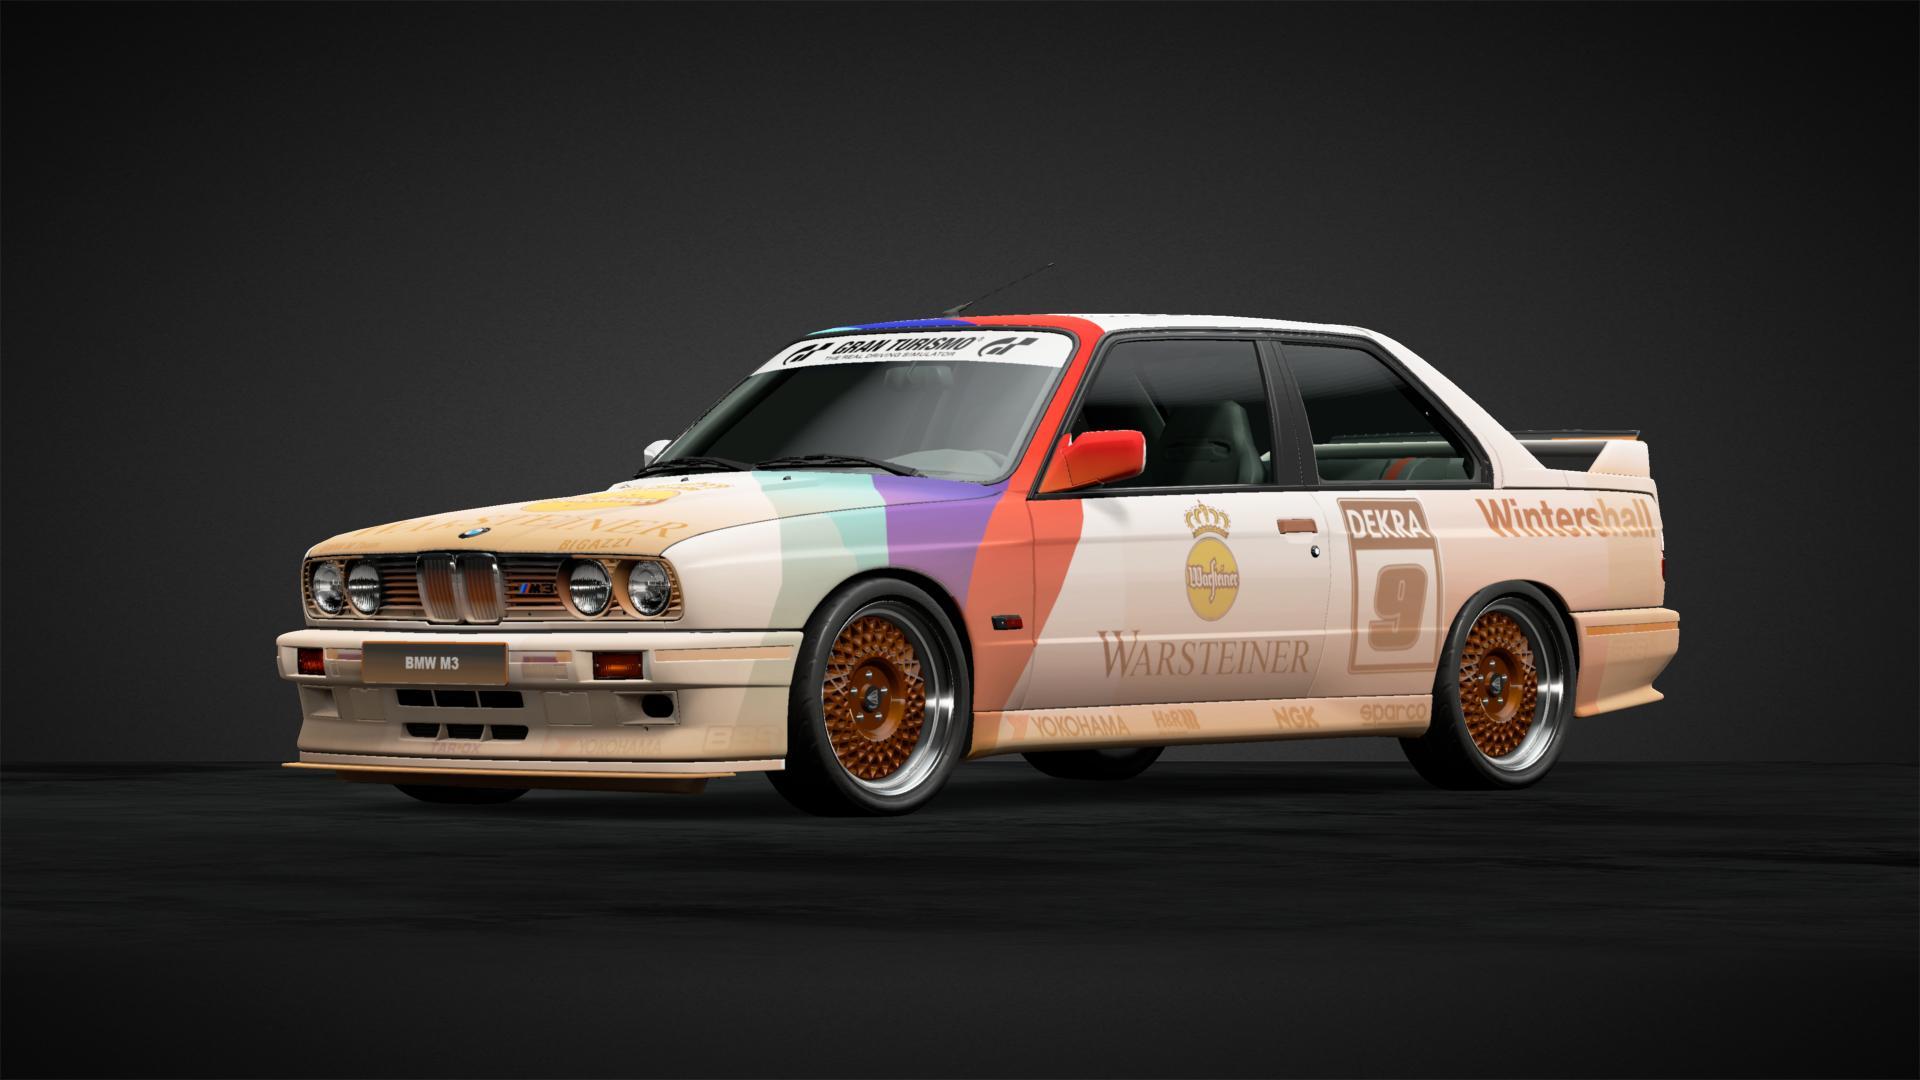 Bmw M3 Rally Design Car Livery By Mrtaiyaki13 Community Gran